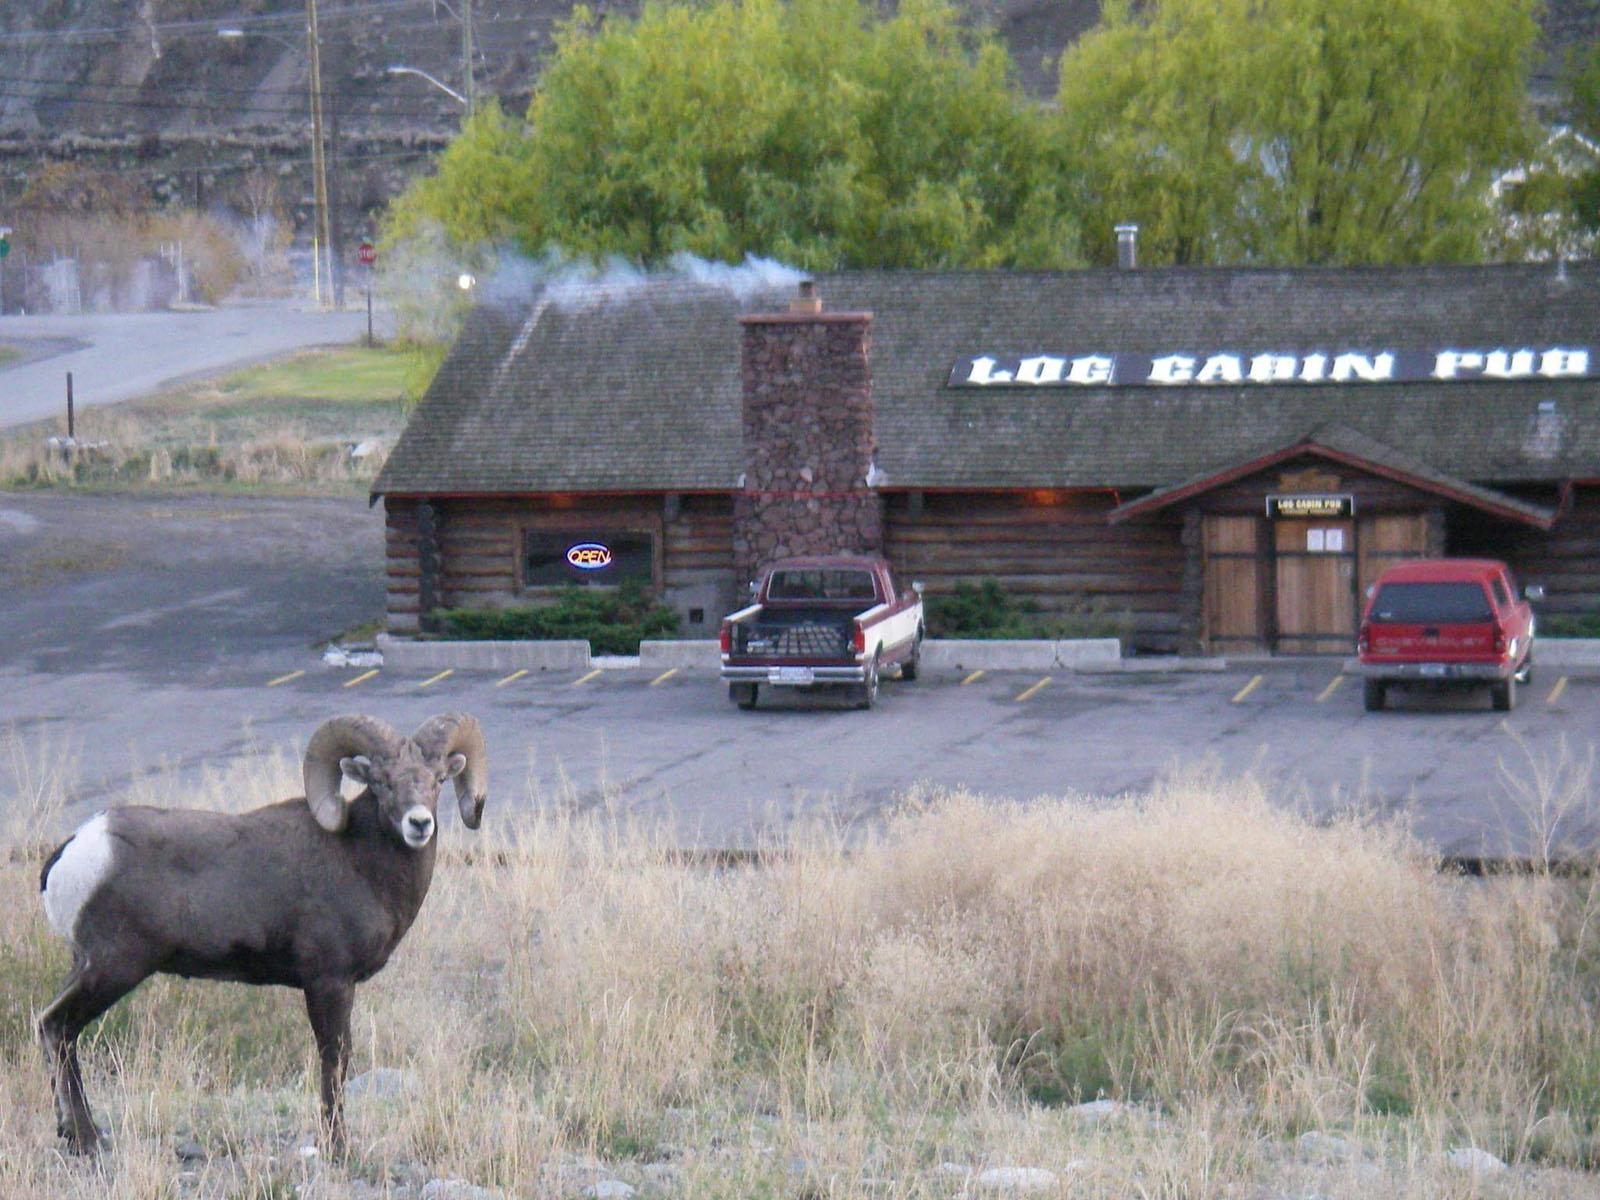 Log cabin pub 34